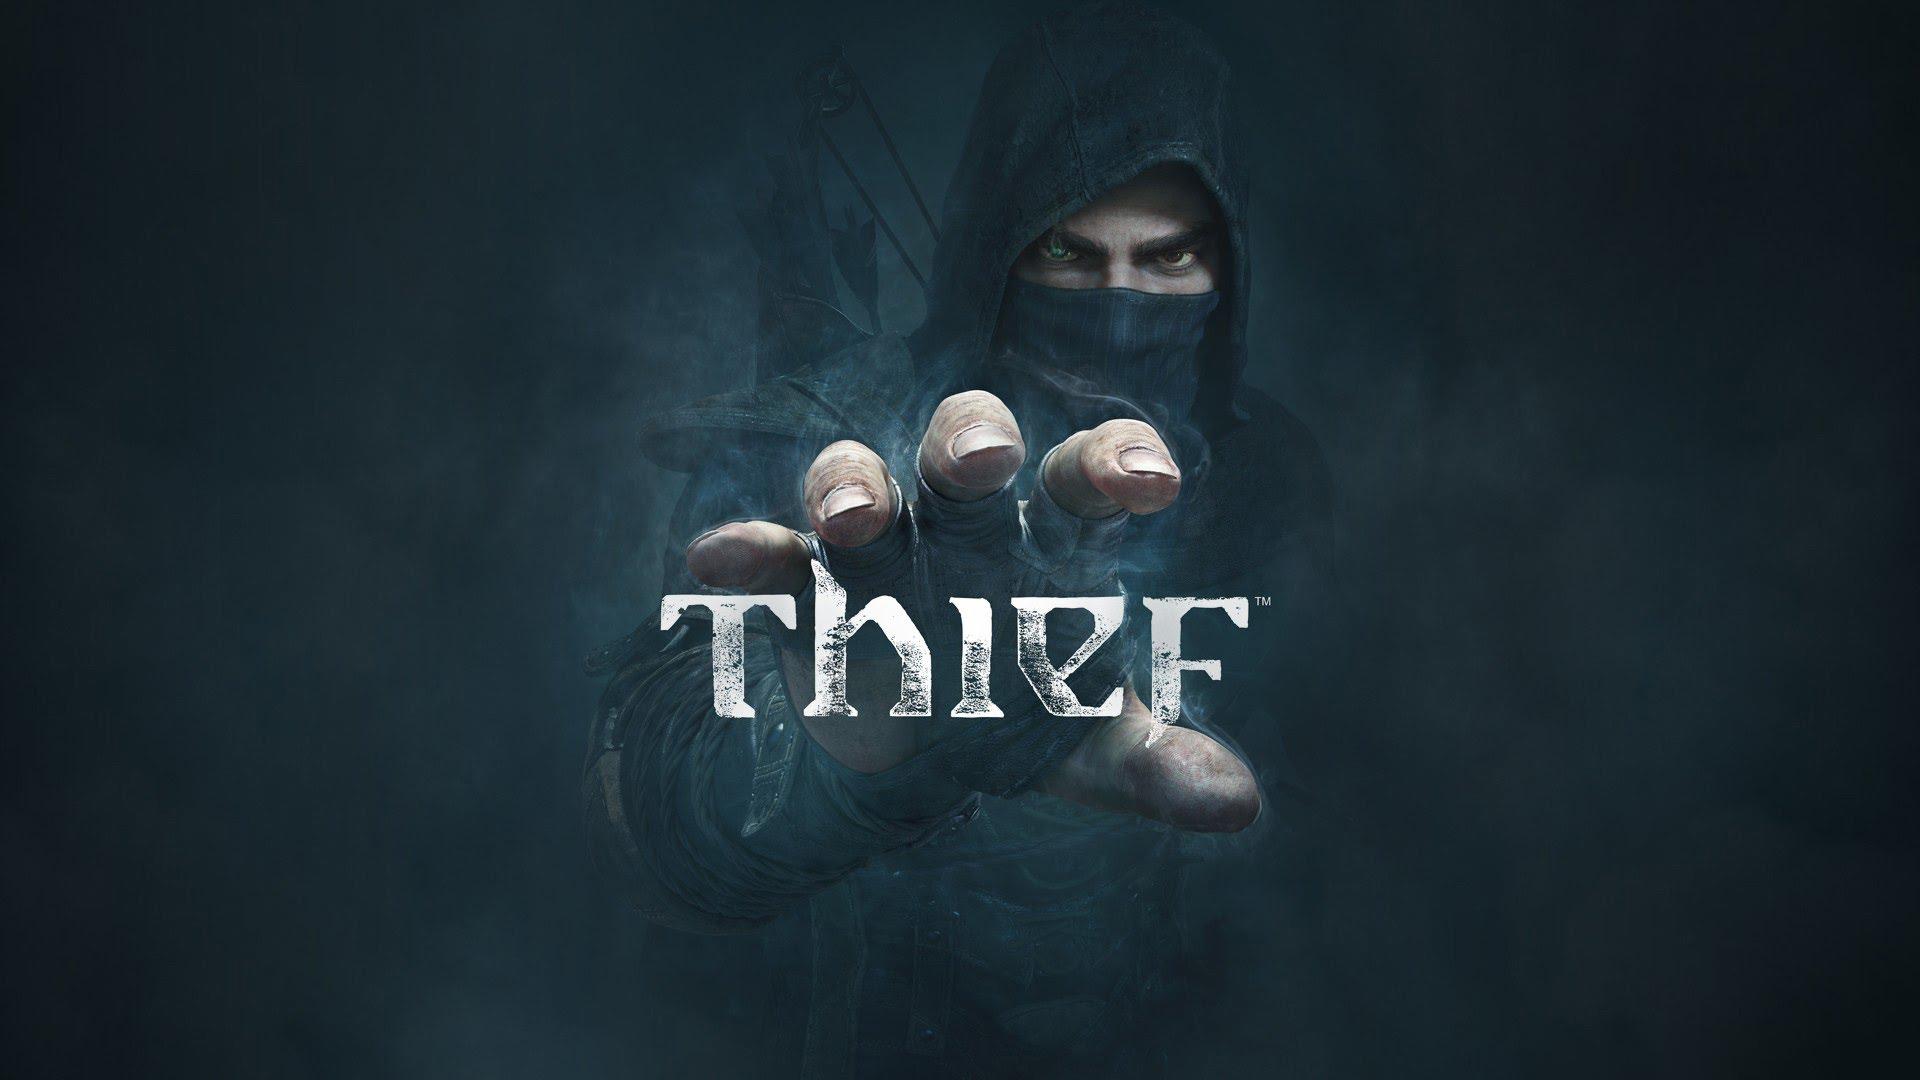 Cкачать игру thief: master thief edition [update 2] (2014) pc.